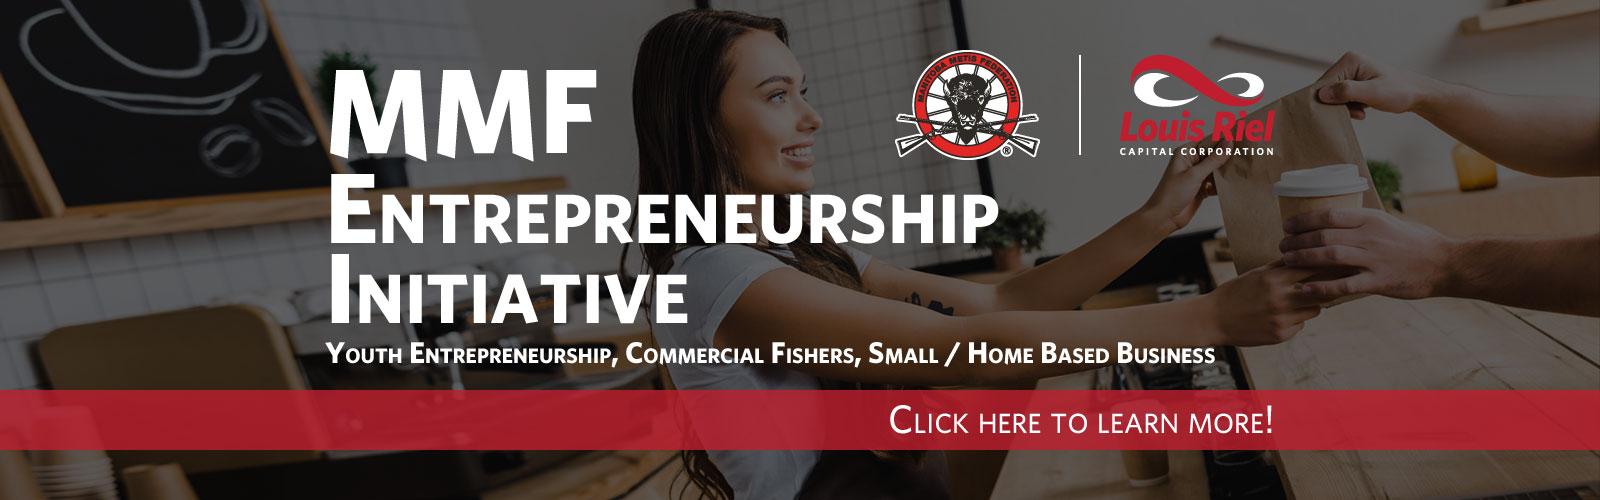 MMF Entrepreneurship Initiative